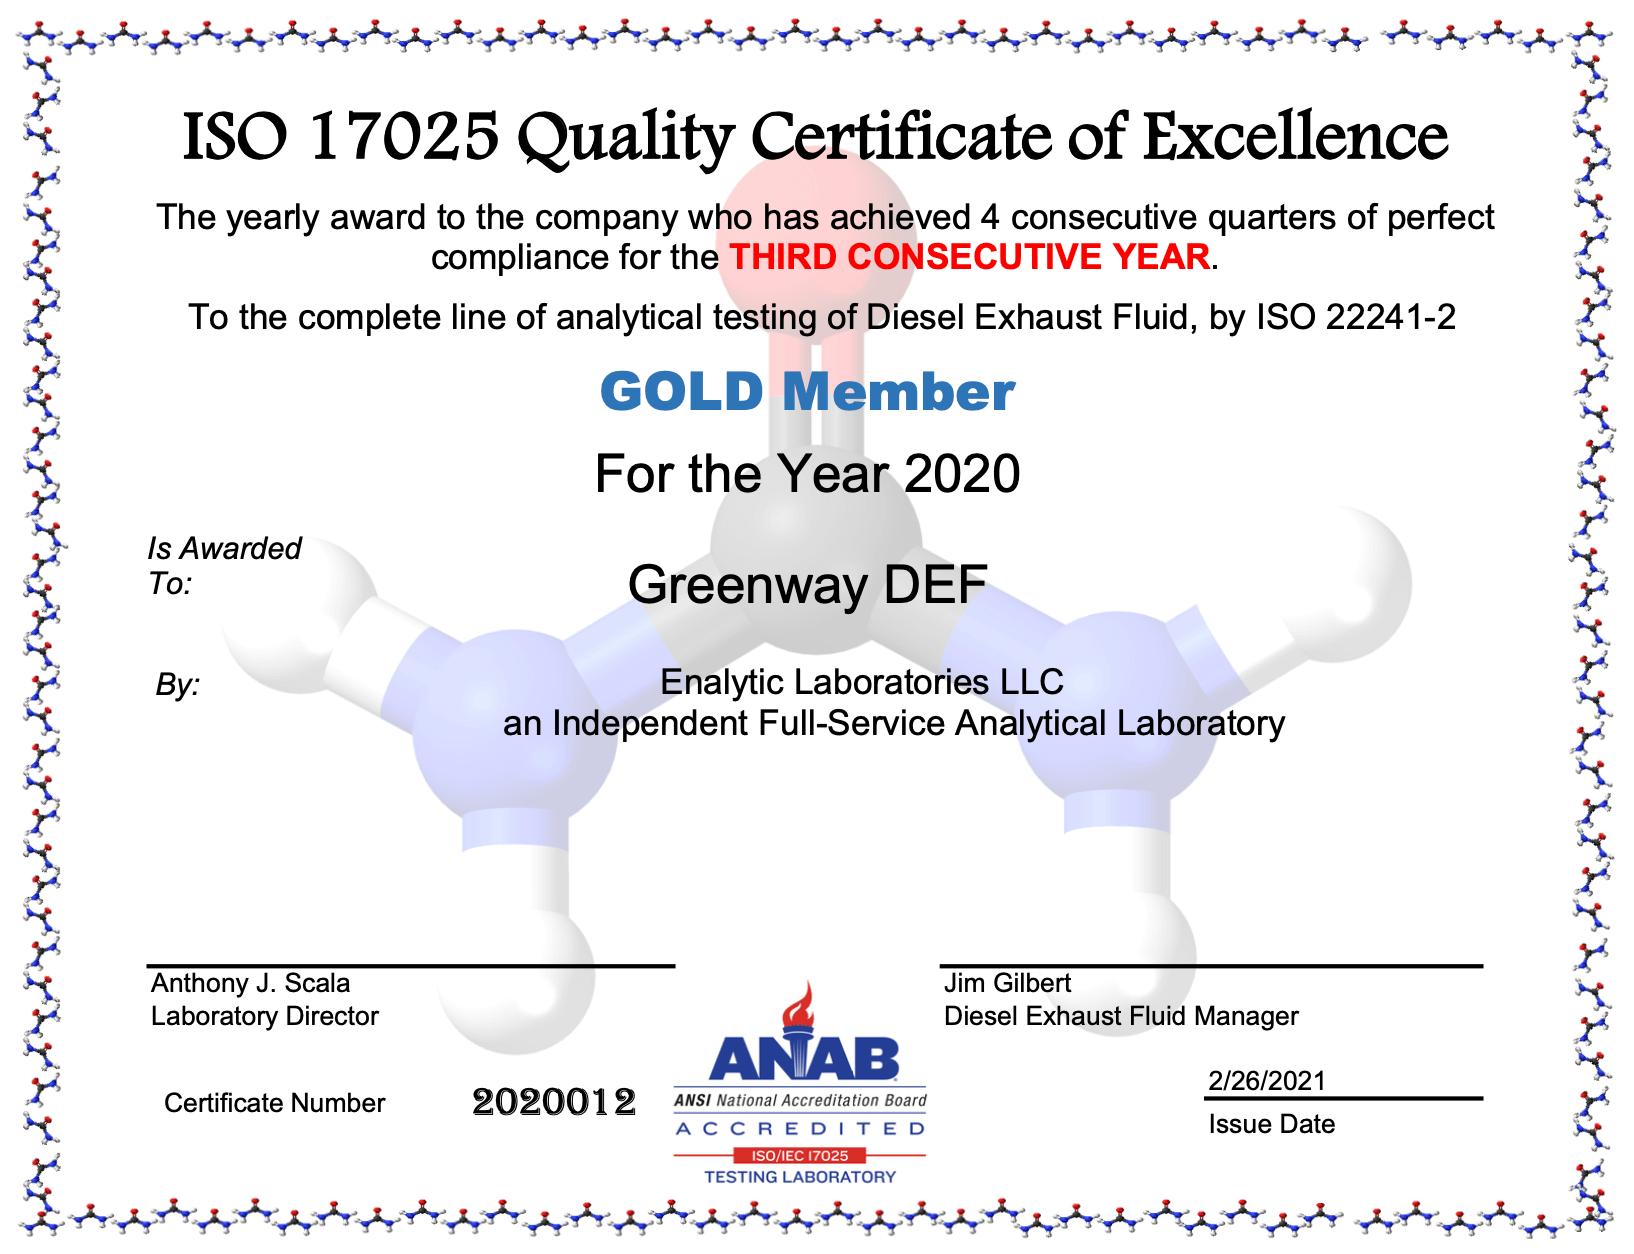 Deisel Exhaust Fluid Certification